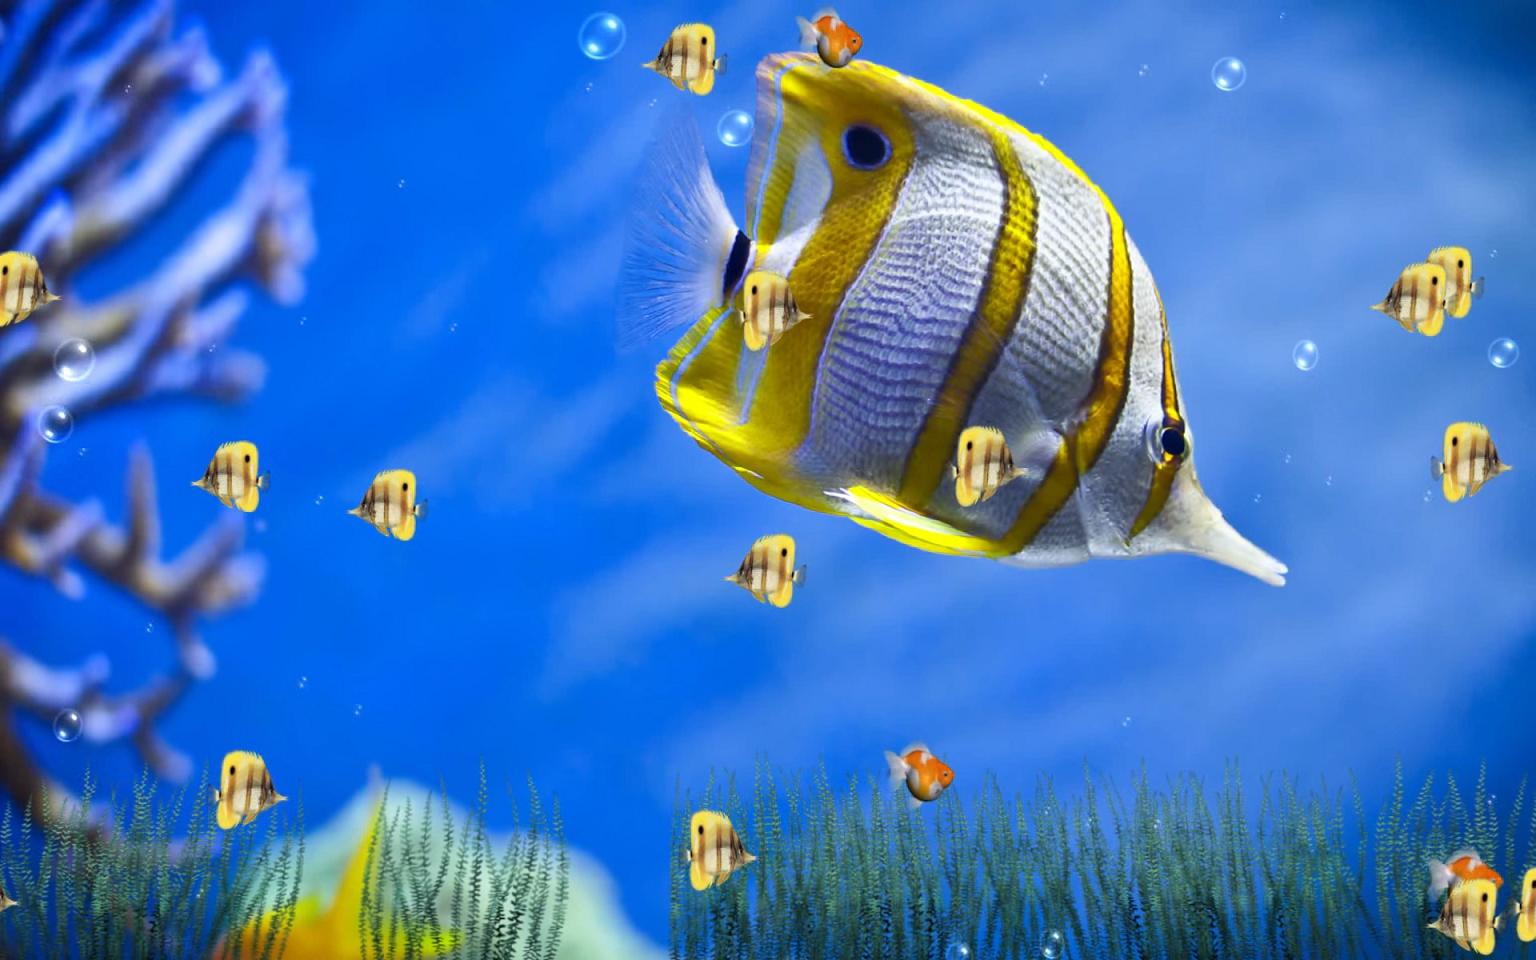 Download Wallpaper Aquarium Bergerak Untuk Windows 7 Aquarium